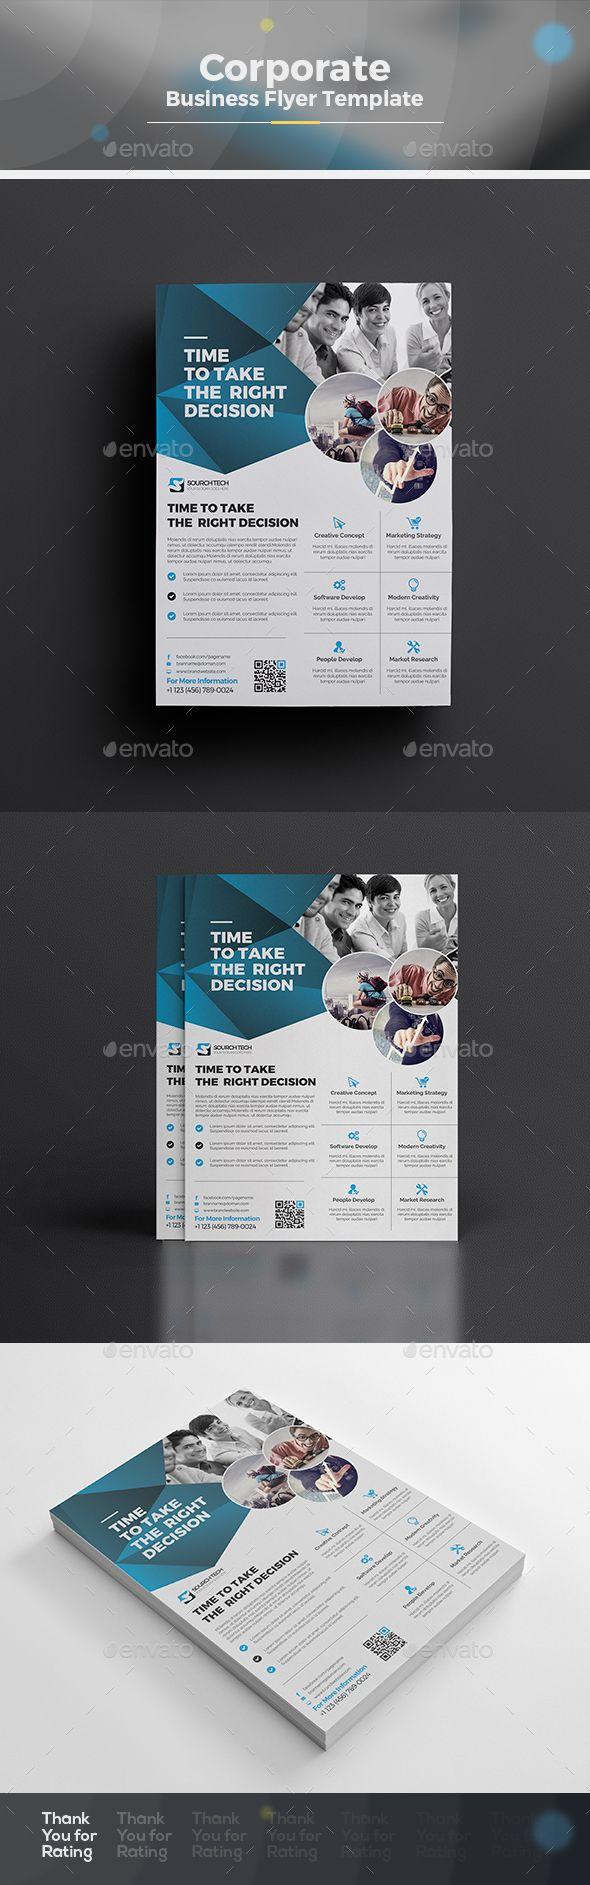 Corporate Flyer Template Vector EPS, AI Illustrator